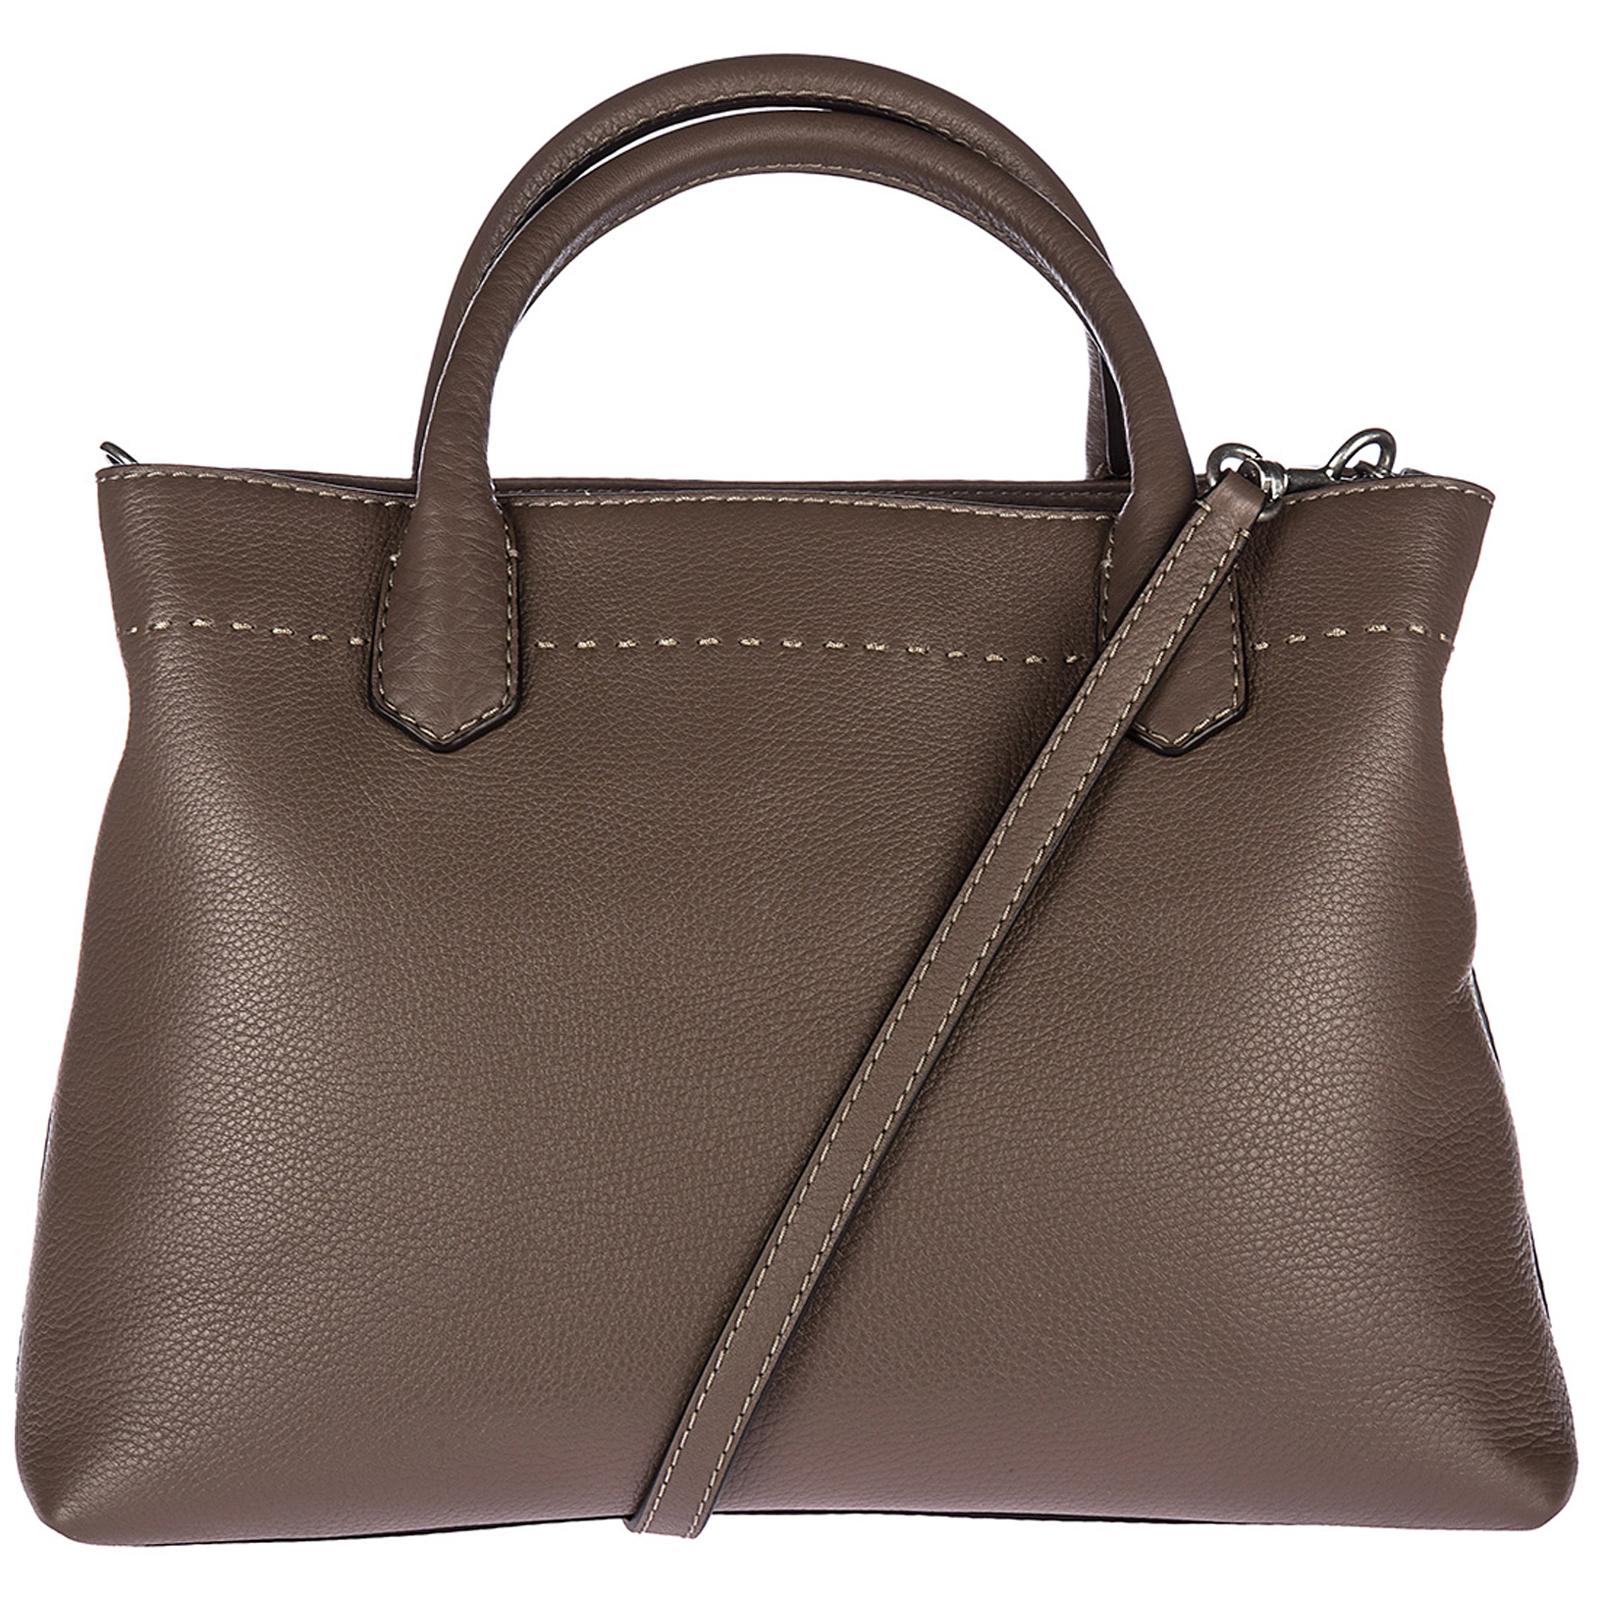 f1f0f2138b9a36 Tory Burch Women s leather handbag shopping bag purse mcgraw